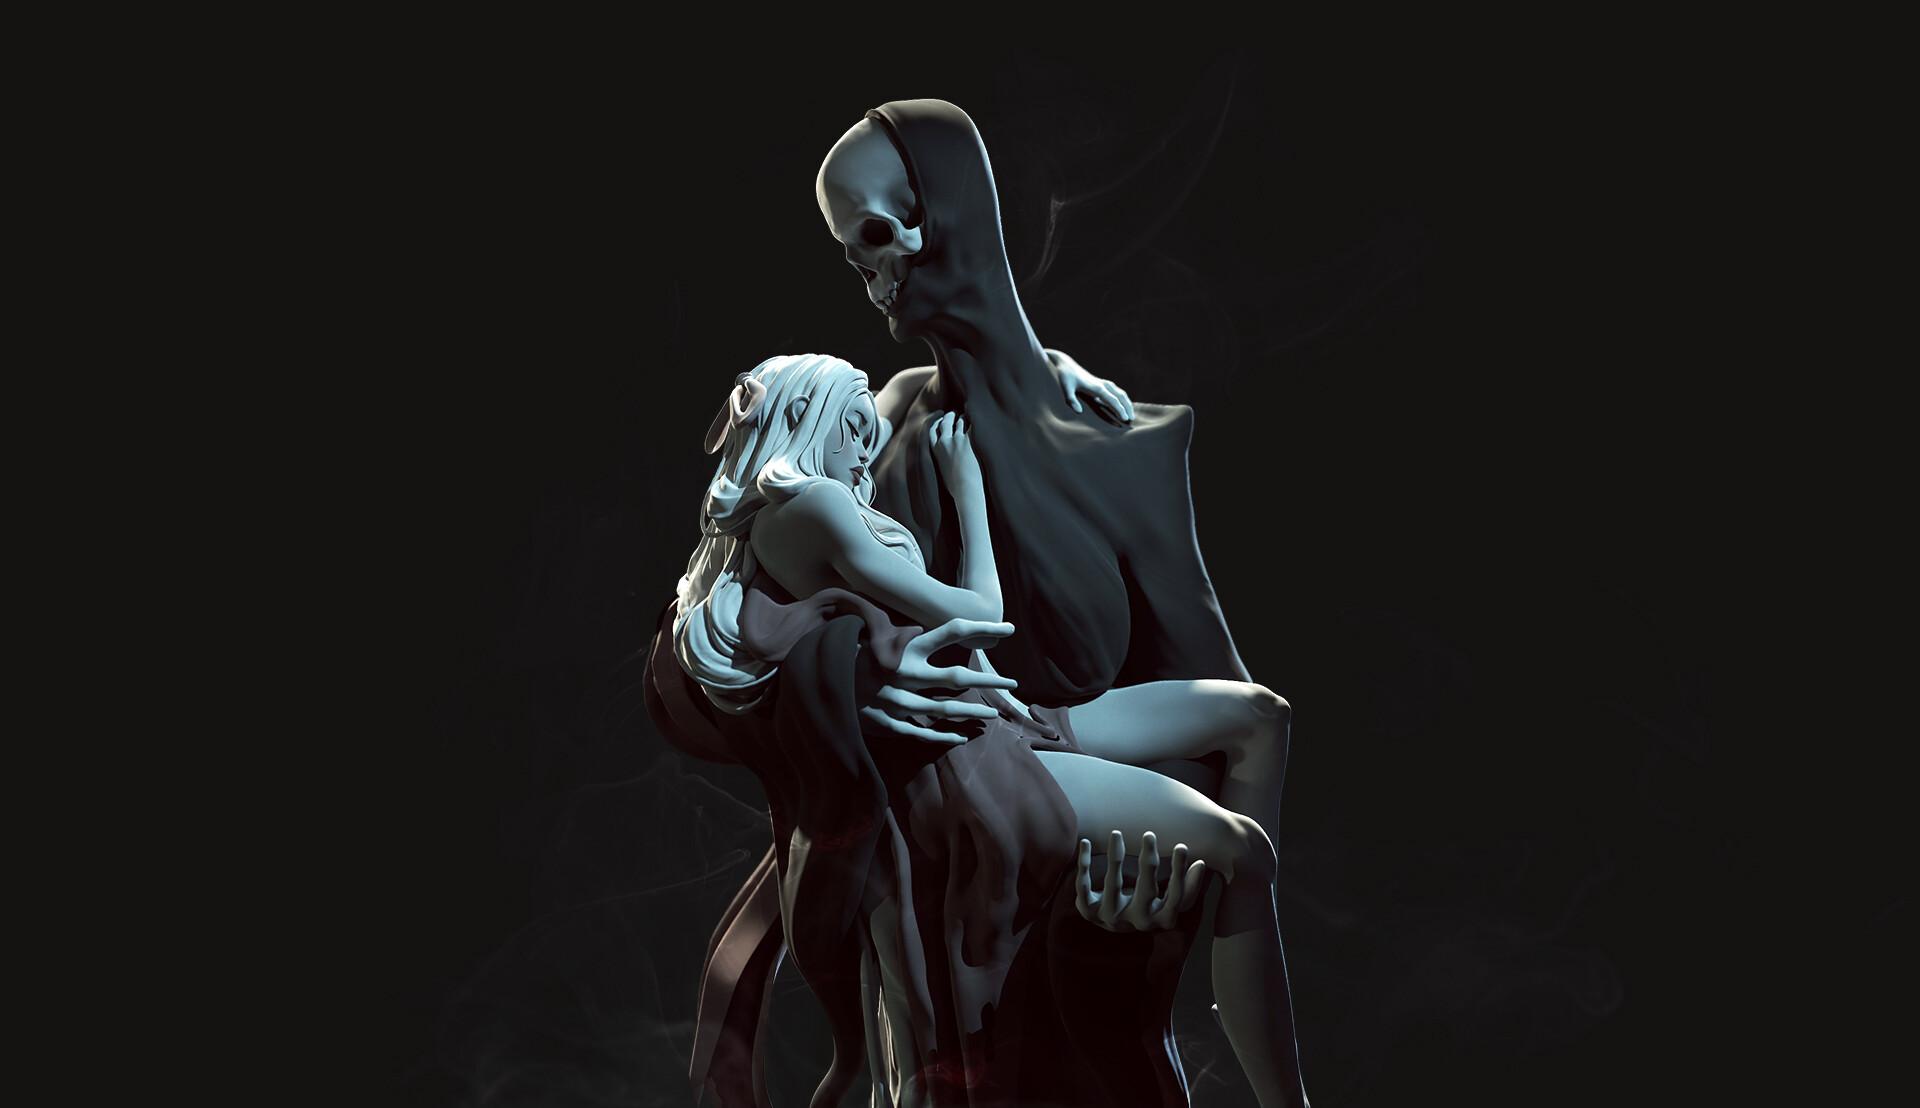 General 1920x1108 Natalia P. Gutiérrez artwork simple background black background Grim Reaper women fantasy art fantasy girl